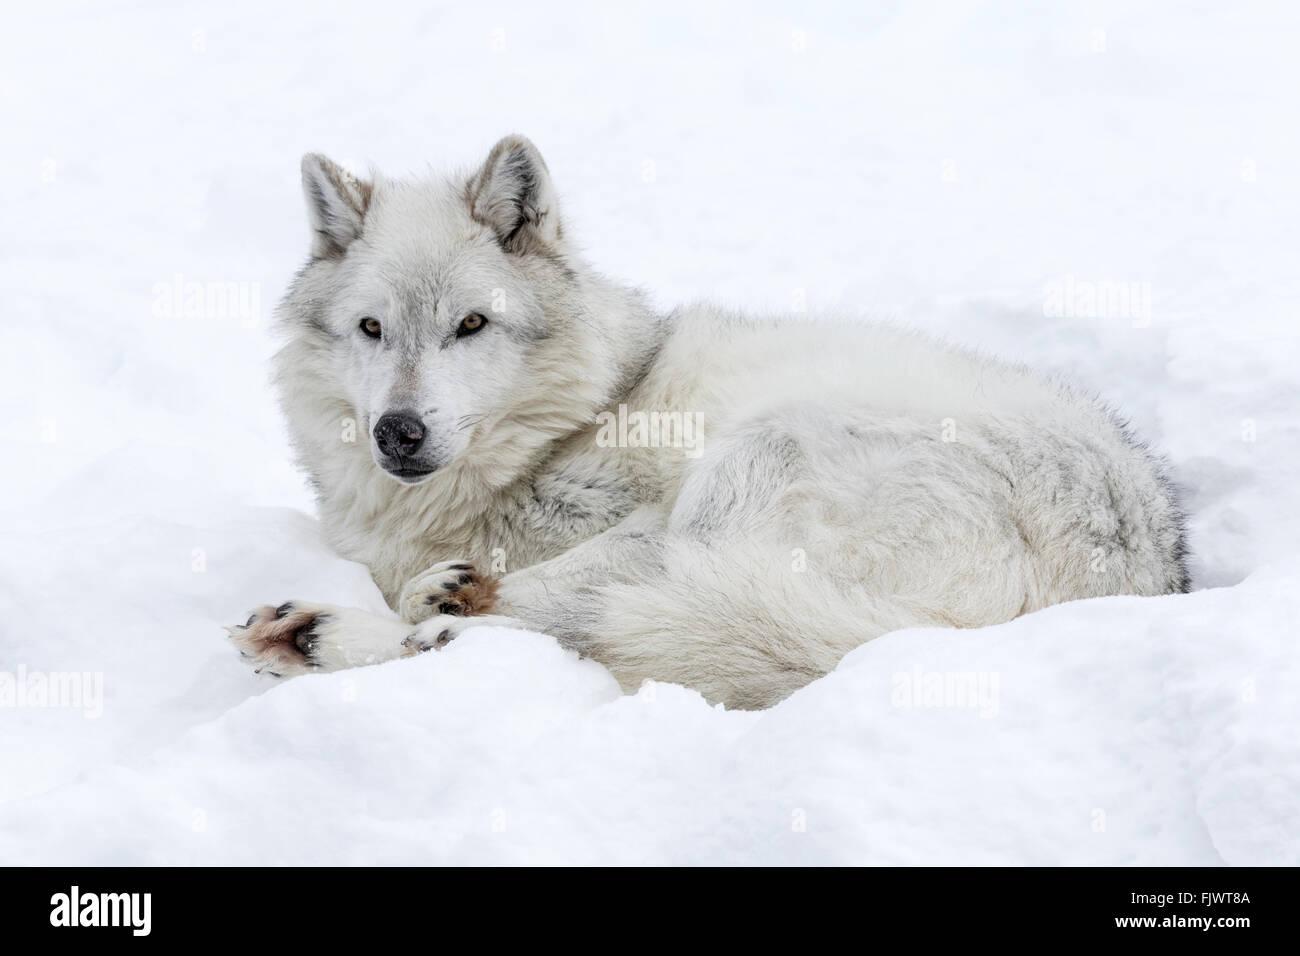 Gray Wolf - Stock Image